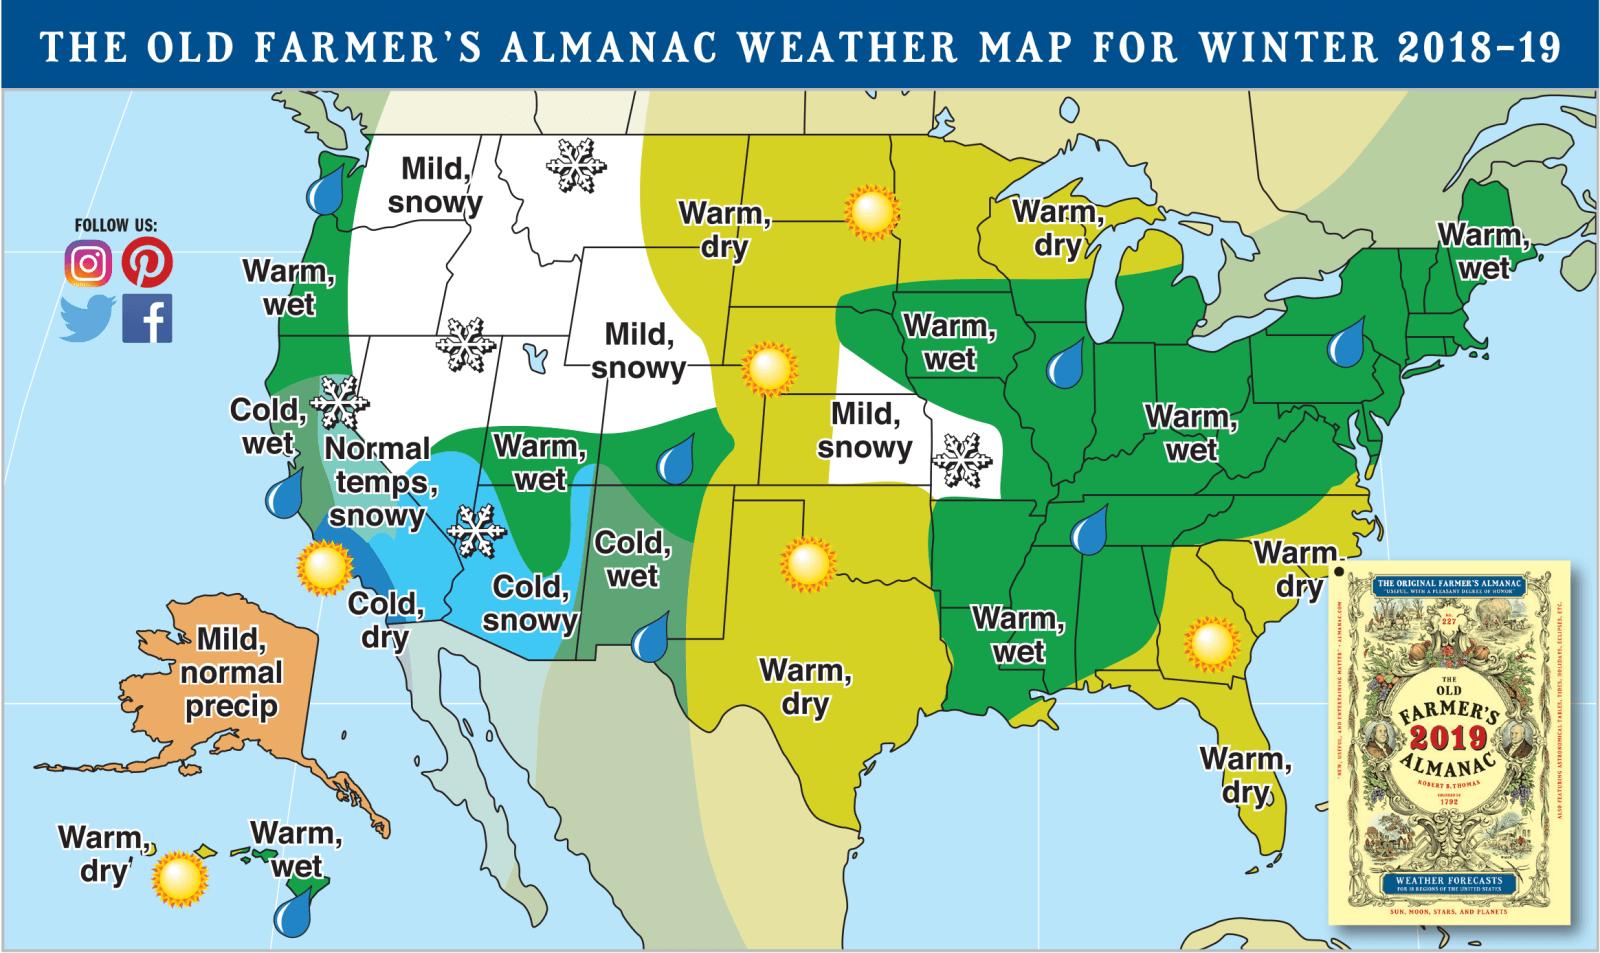 south carolina winter forecast 2018-2019 old farmers almanac sc travel guide